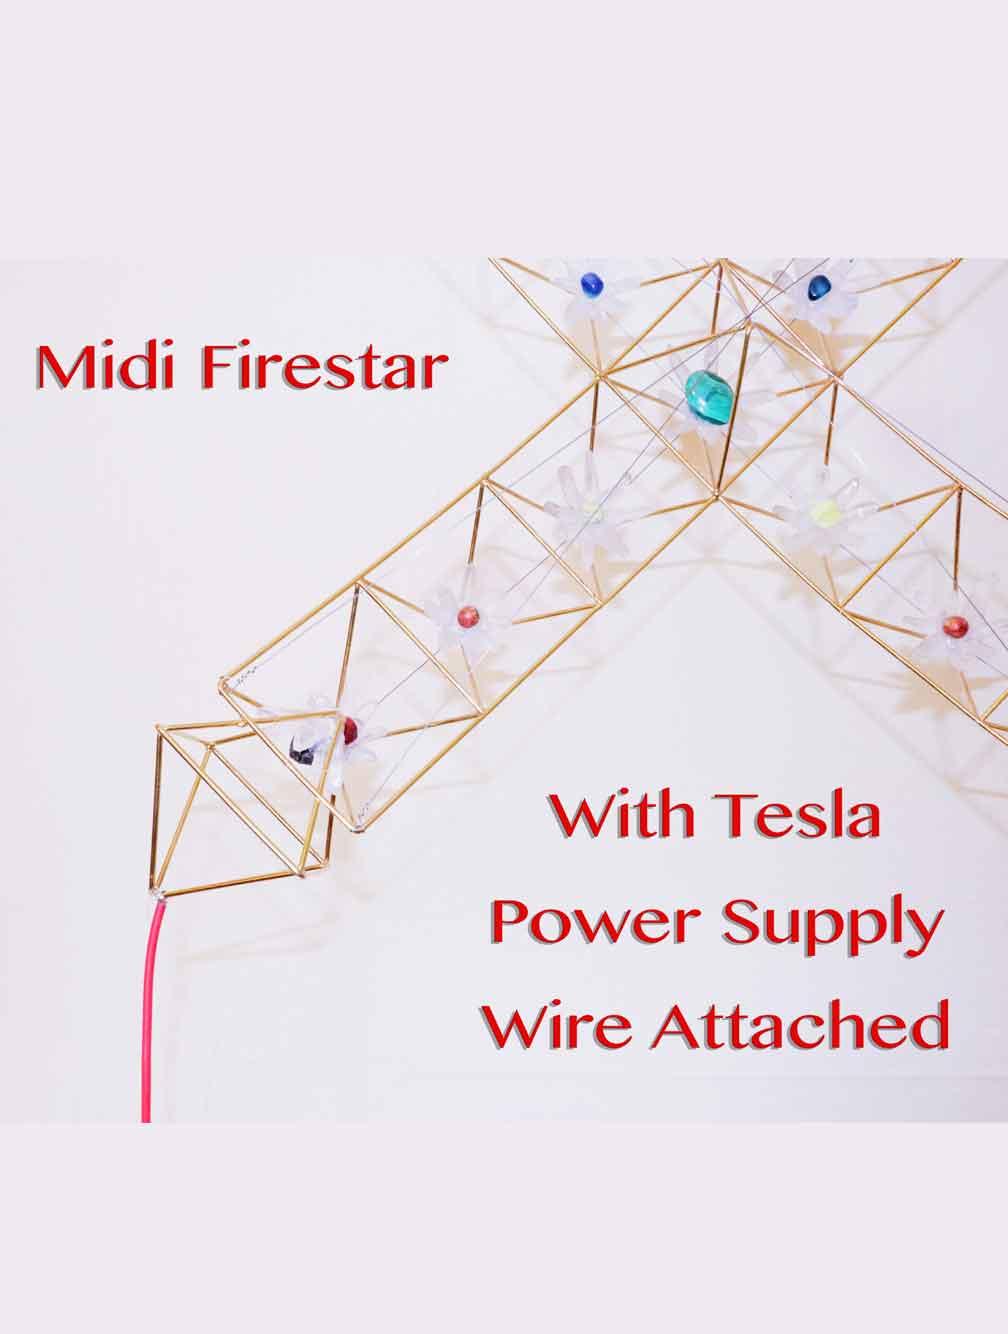 Tesla Power Supply